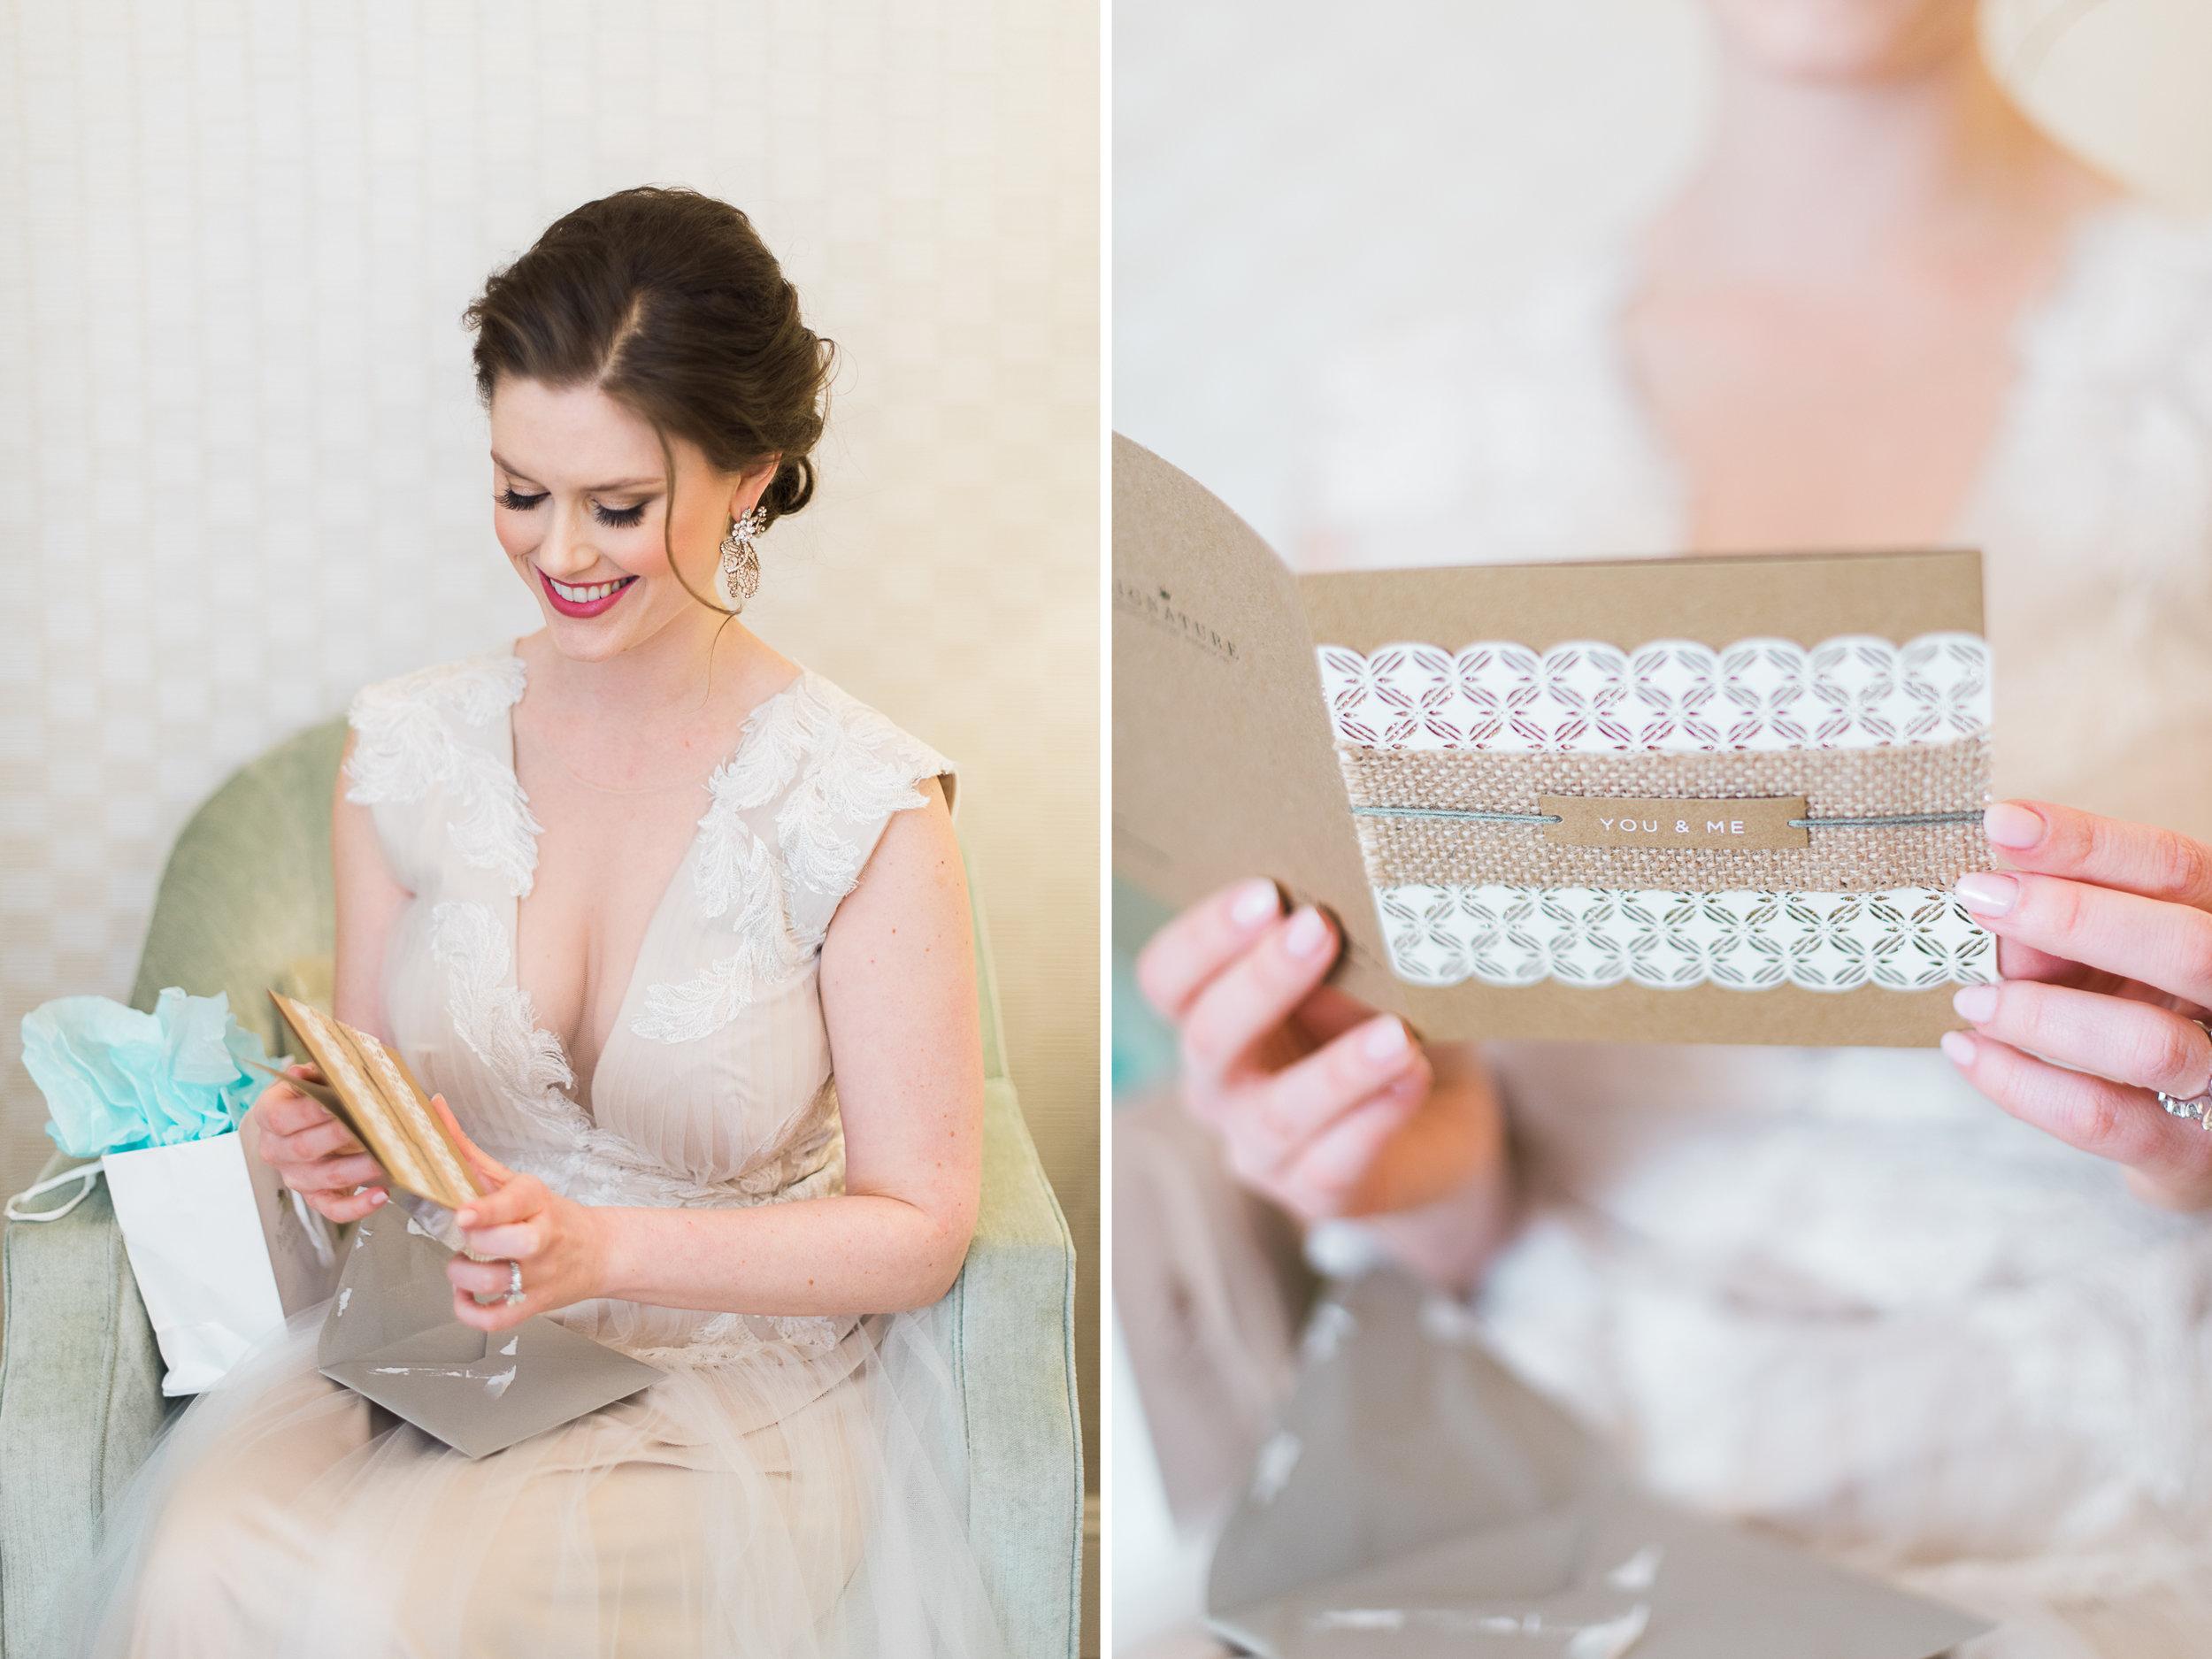 Houston-Wedding-Photographer-Lakeside-Country-Club-First-Look-Bride-Groom-Formals-Film-Fine-Art-Photography-102.jpg